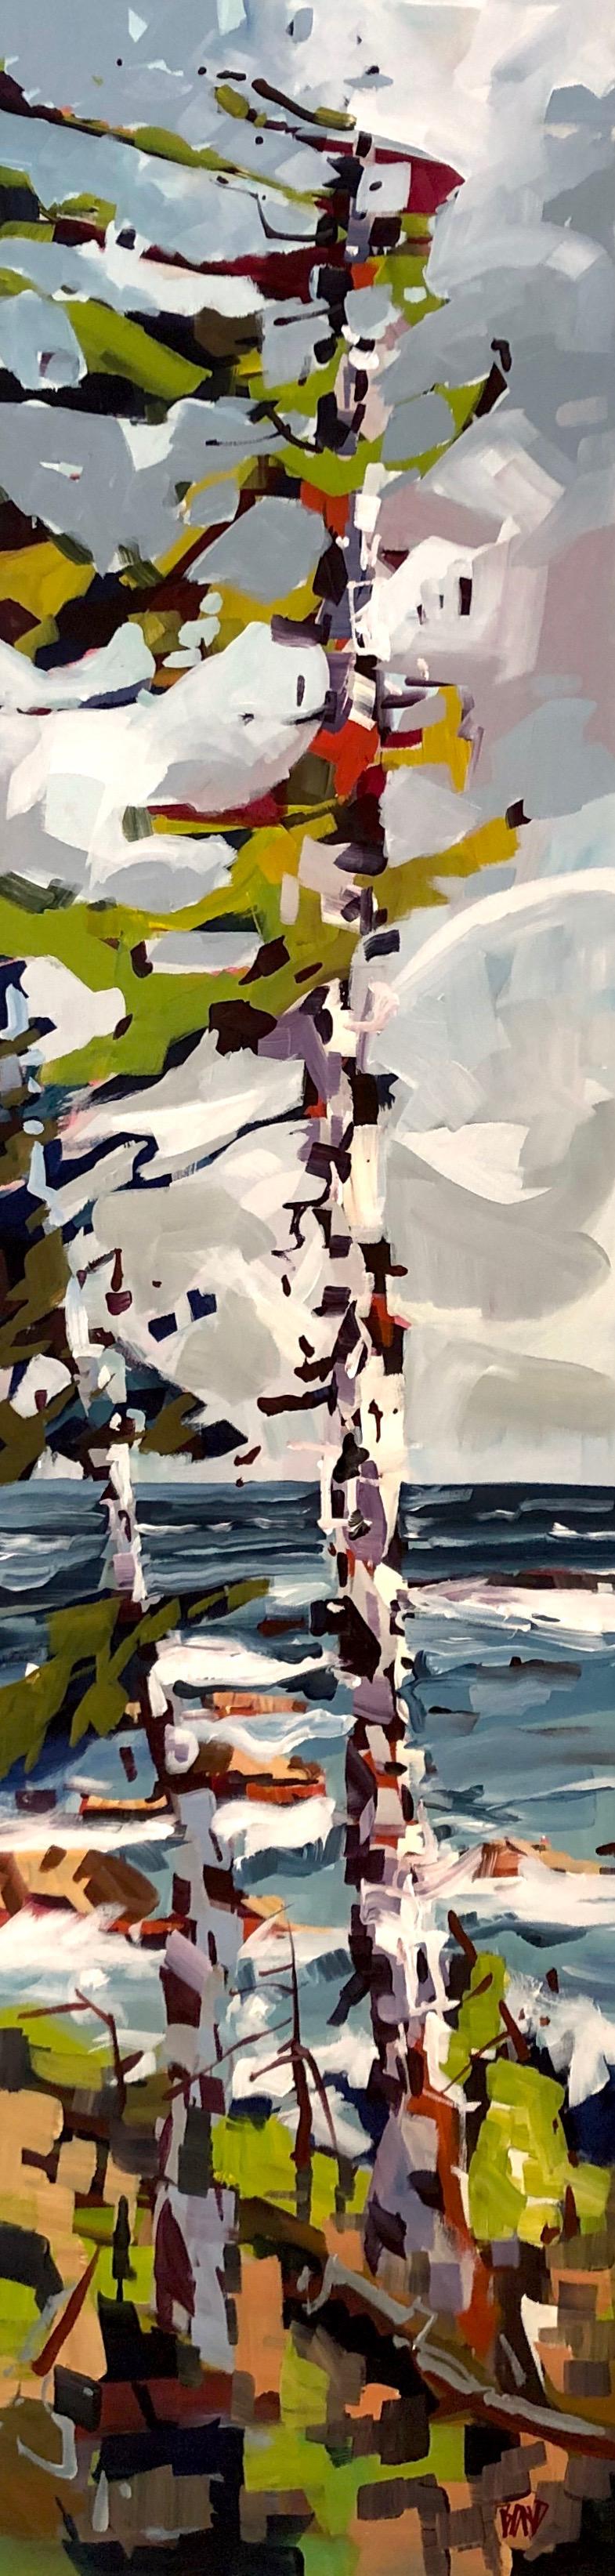 Bond, Winds of Uculet, 72x18,a-c.jpg